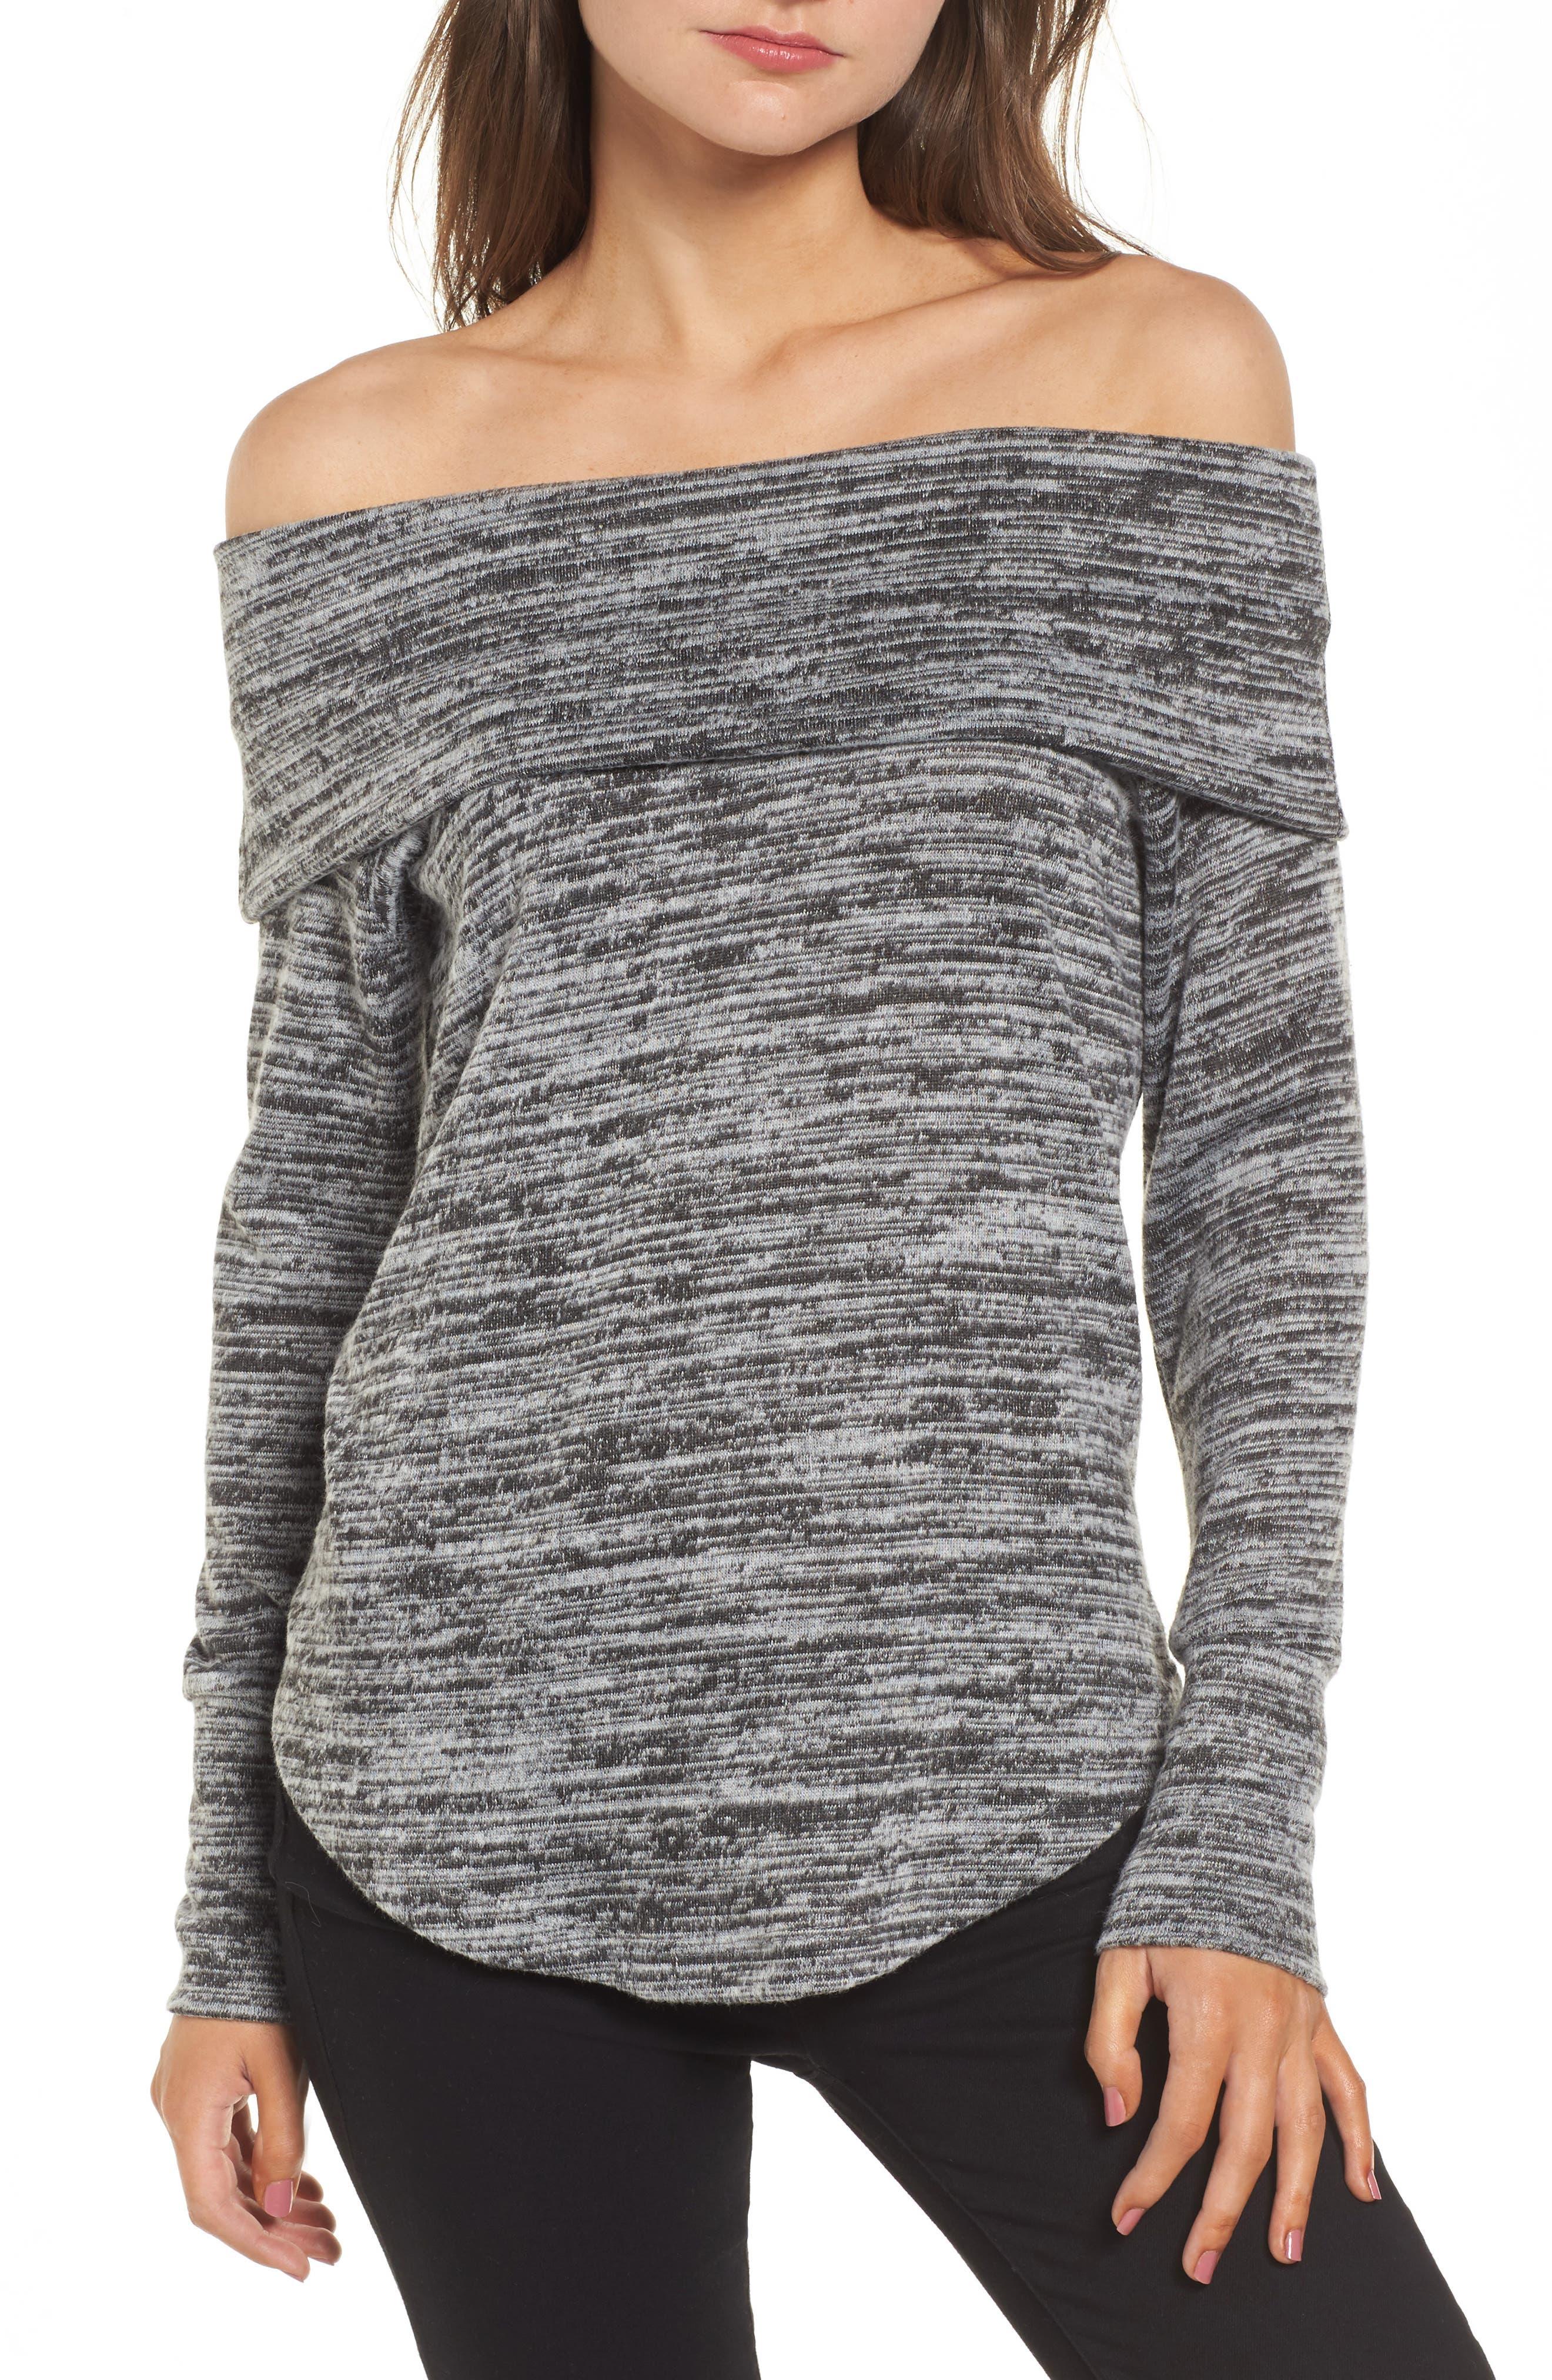 Off the Shoulder Sweatshirt,                             Main thumbnail 1, color,                             Grey/ Black